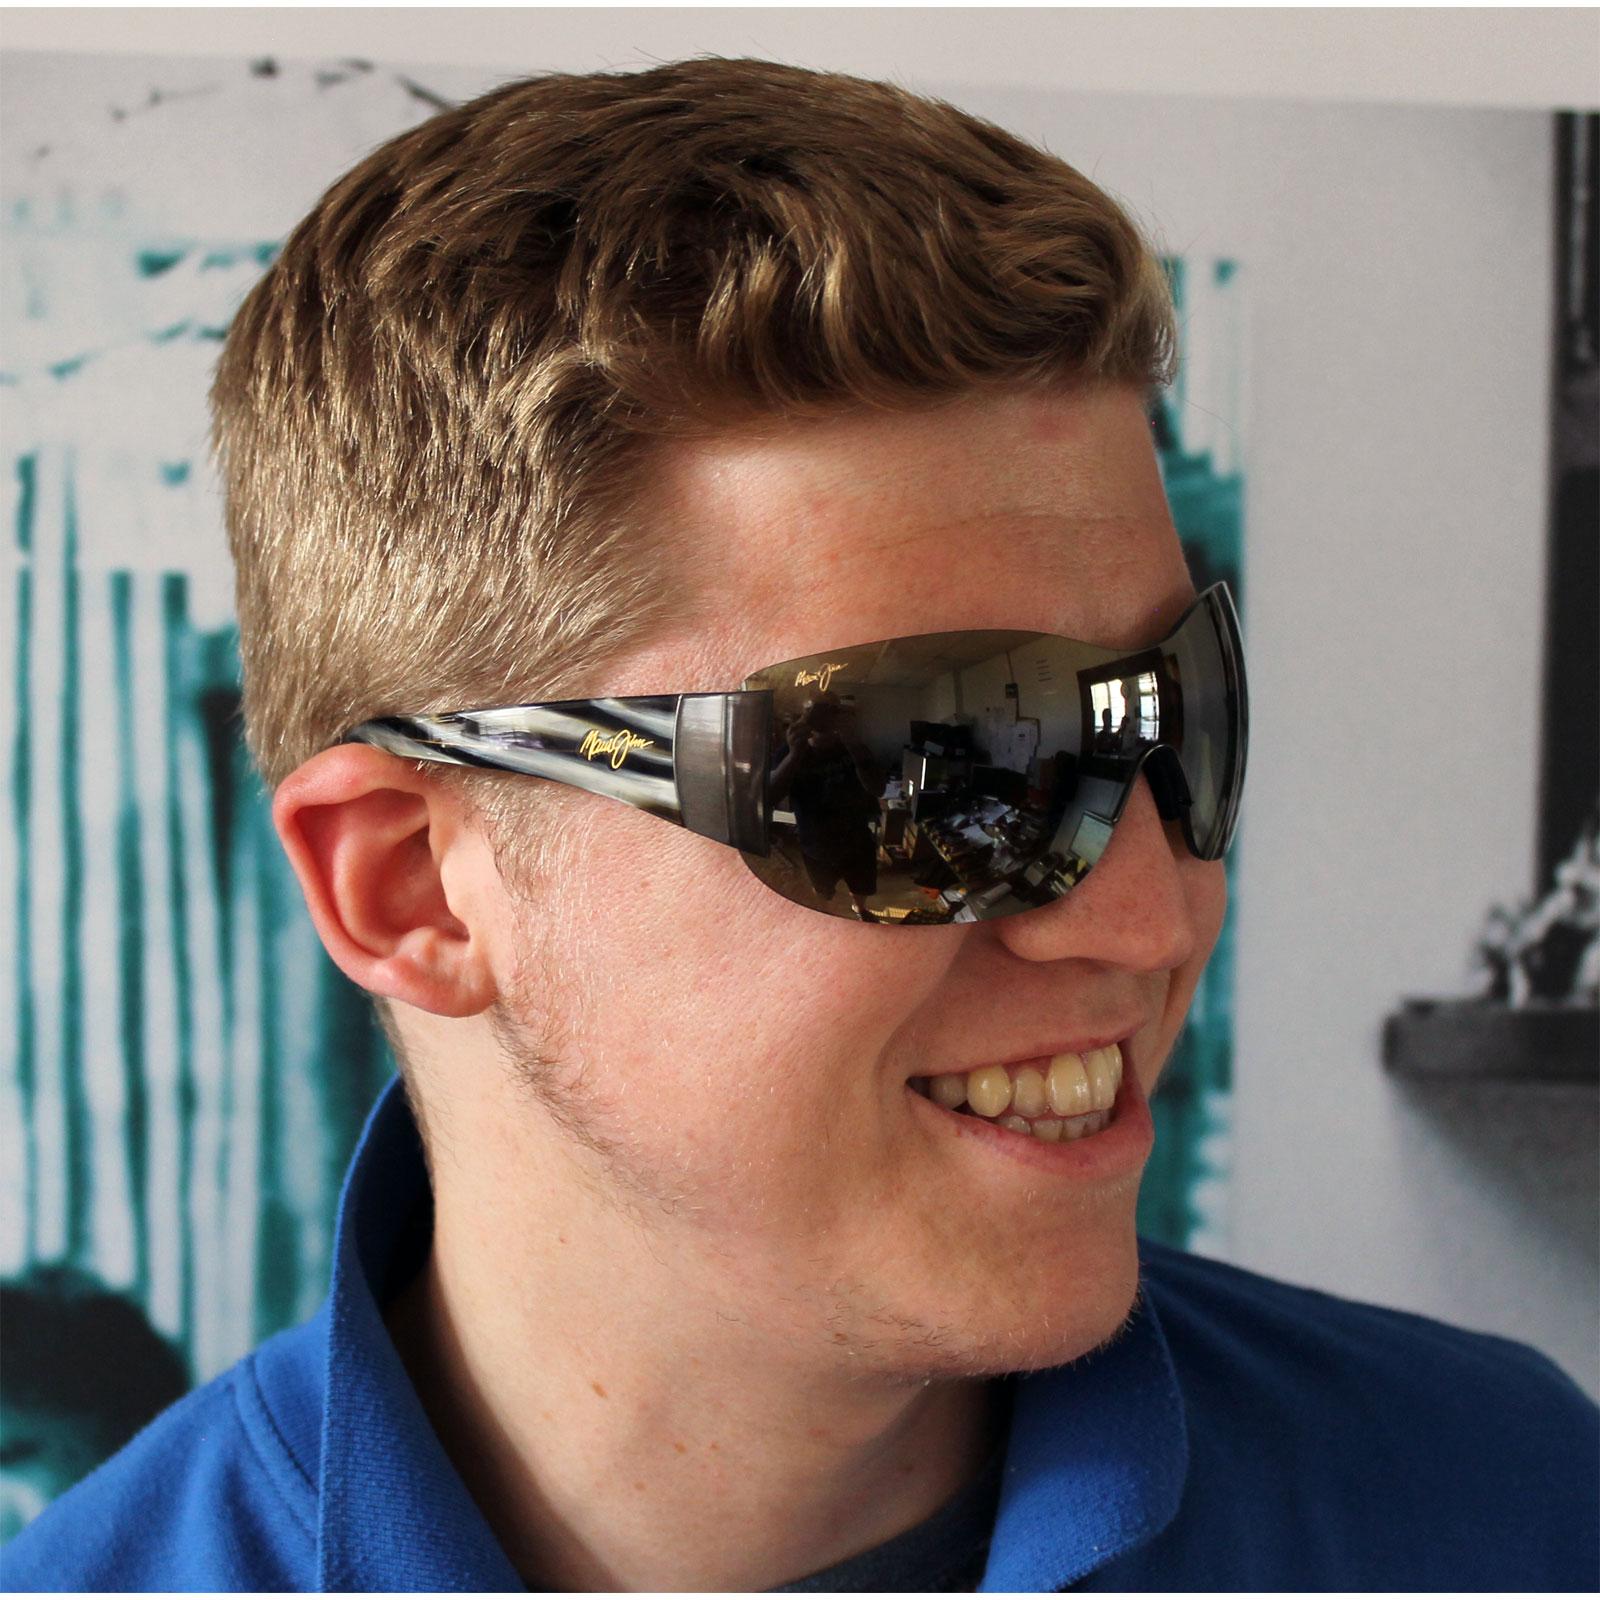 Maui Jim Sunglasses Ebay  maui jim sunglasses kula ht514 02 gunmetal ht green polarized ebay